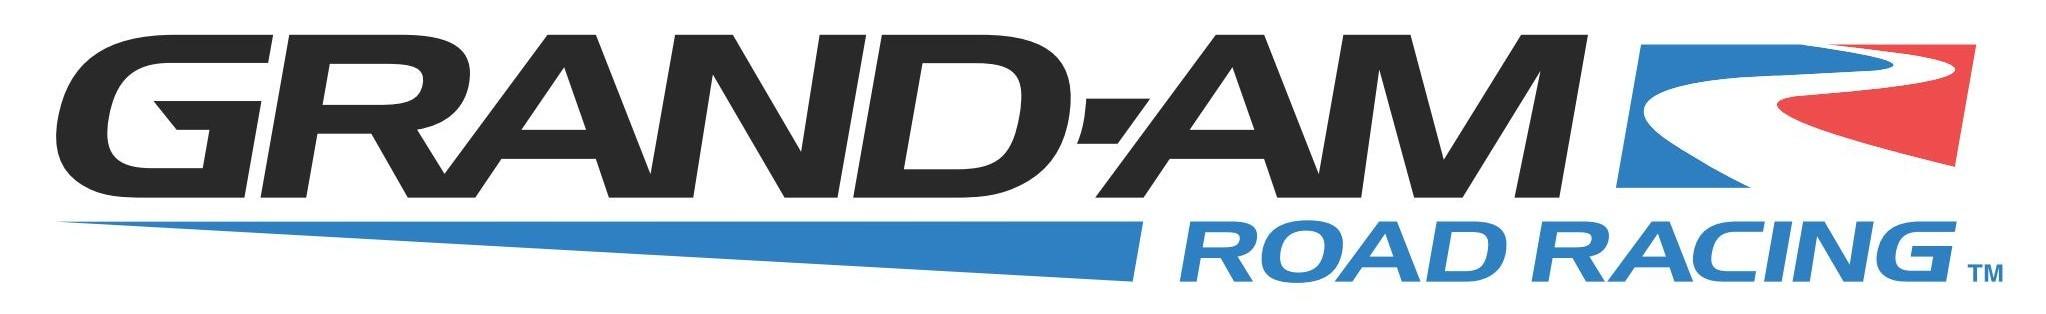 Grand Am Road Racing Logo [EPS File]